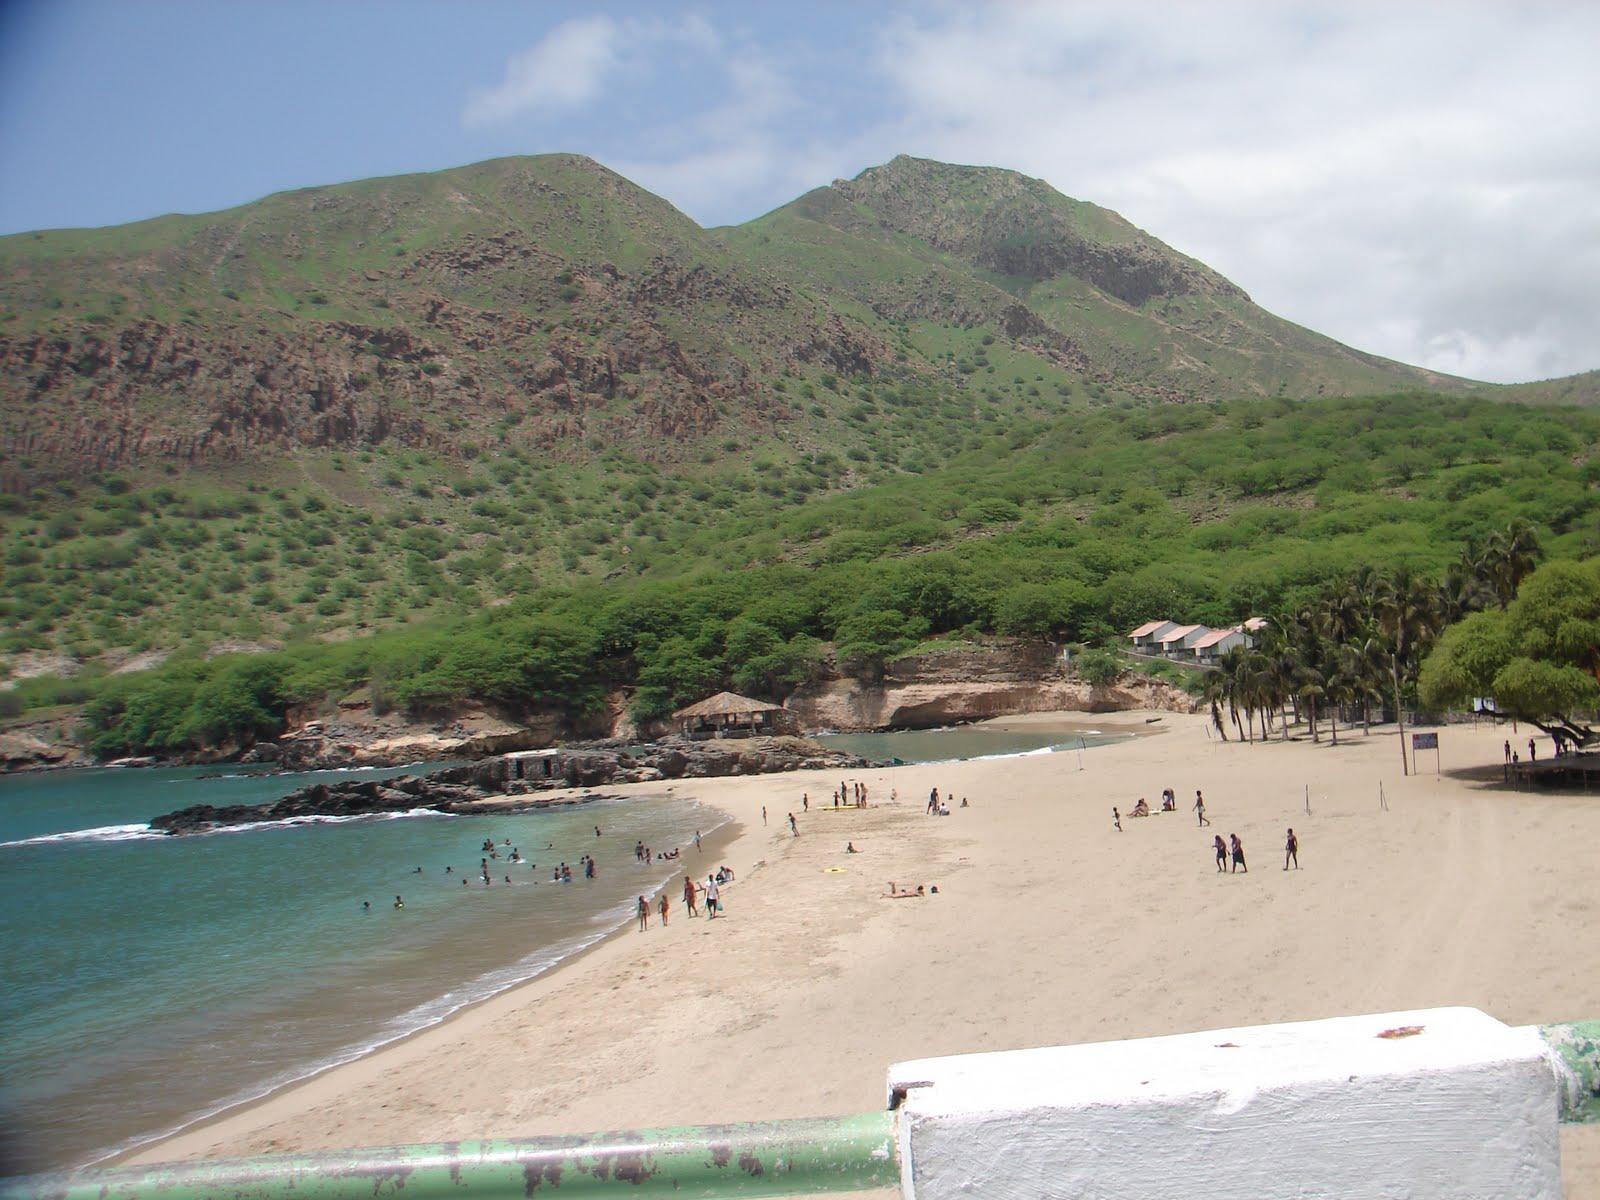 Playas de santiago cabo verde tropical fishing - Cabo verde senegal ...